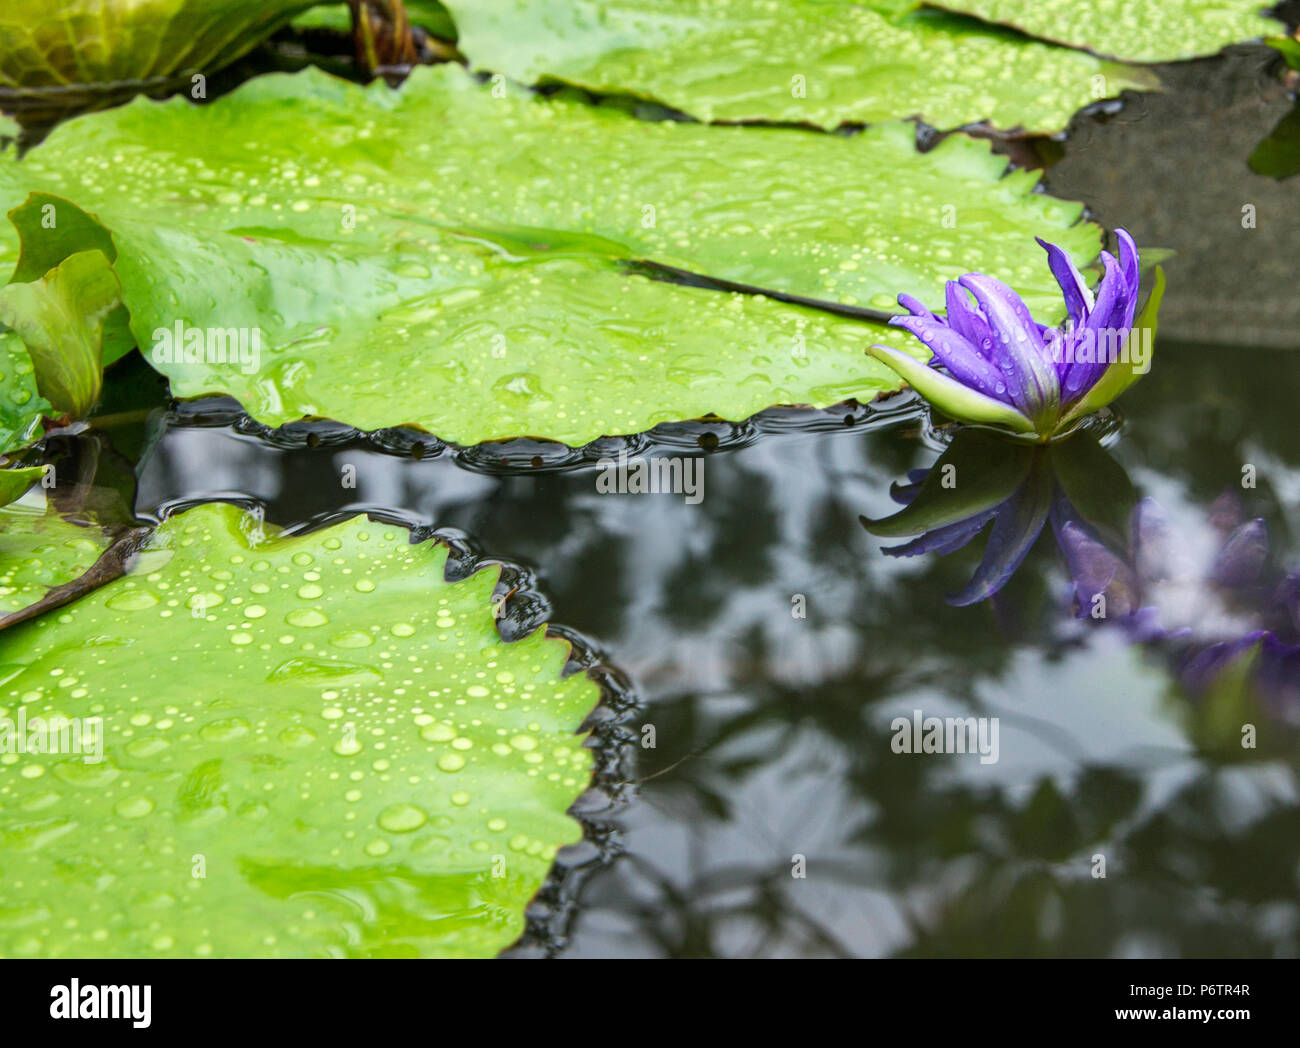 Lotus flower in pond waterlilly blossom in garden raindrops on lotus flower in pond waterlilly blossom in garden raindrops on leaves natural background izmirmasajfo